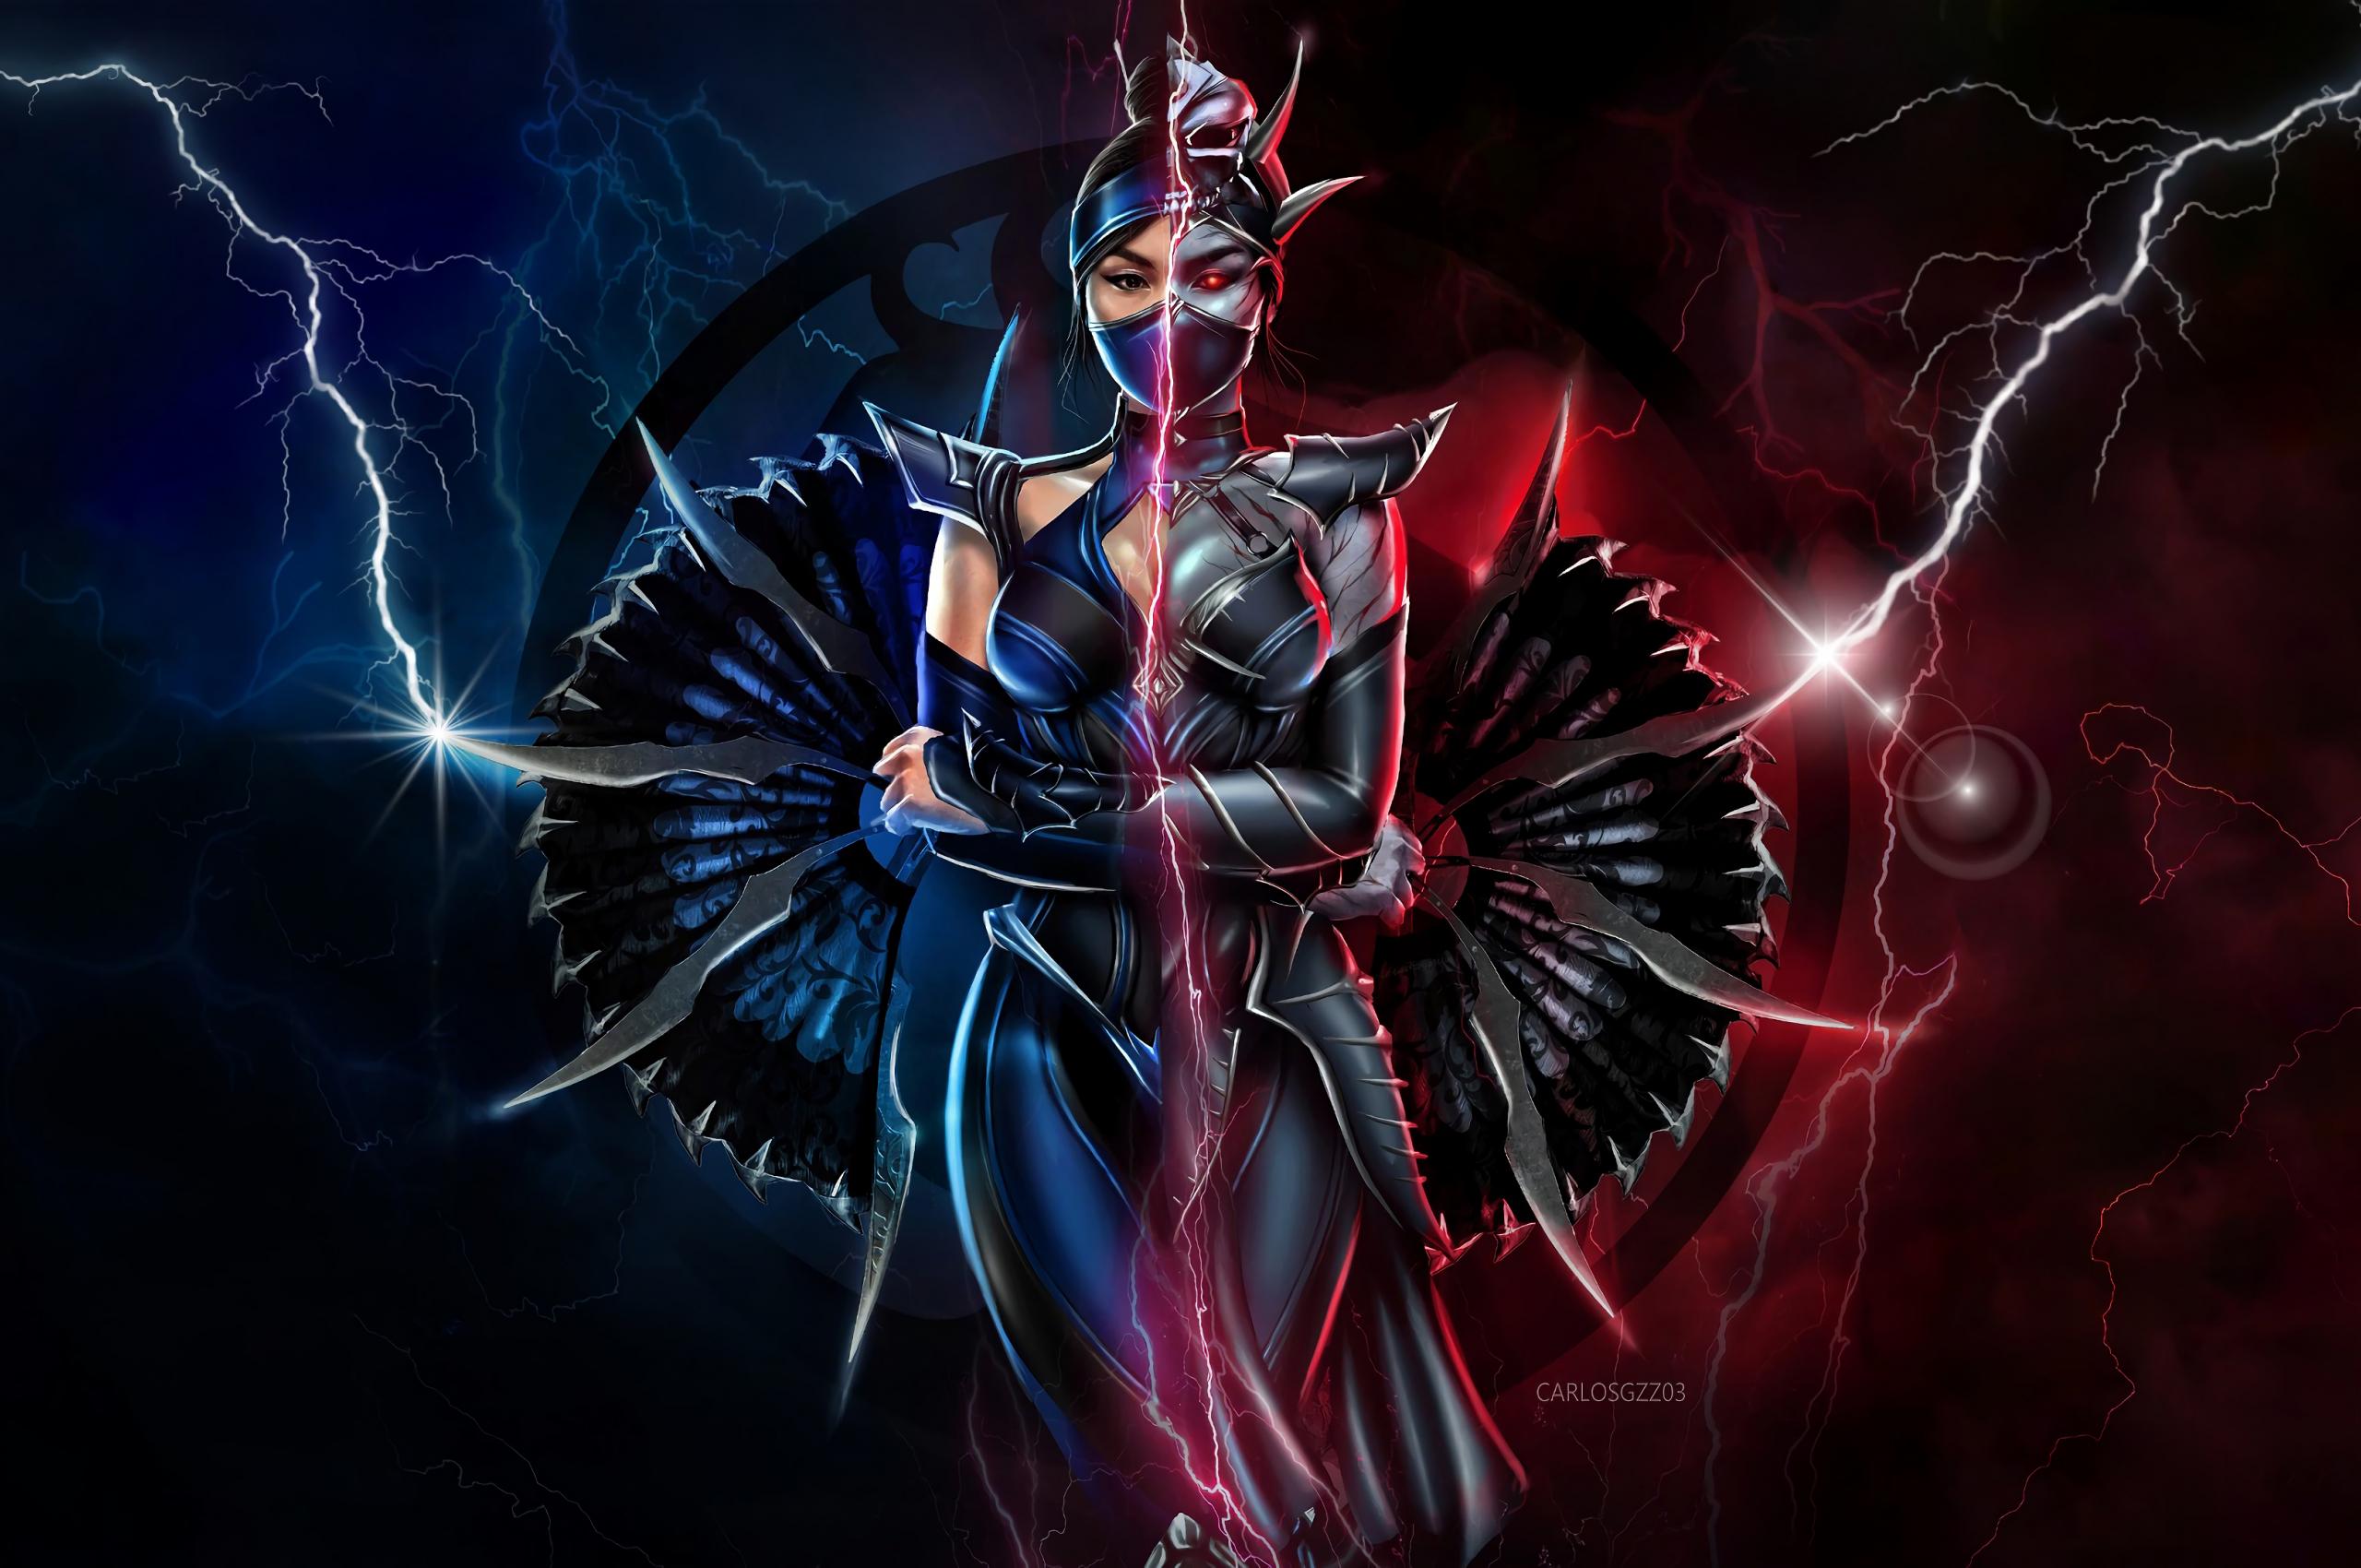 Free Download Kitana Mortal Kombat 11 Wallpaper Hd Artist 4k